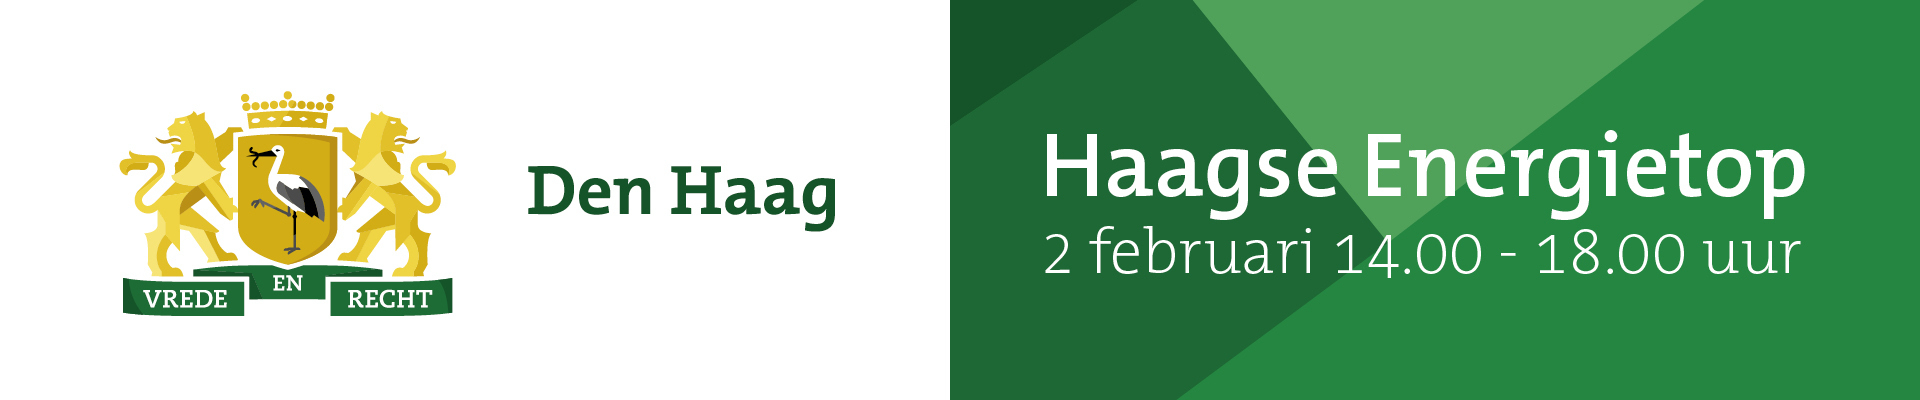 Haagse Energietop